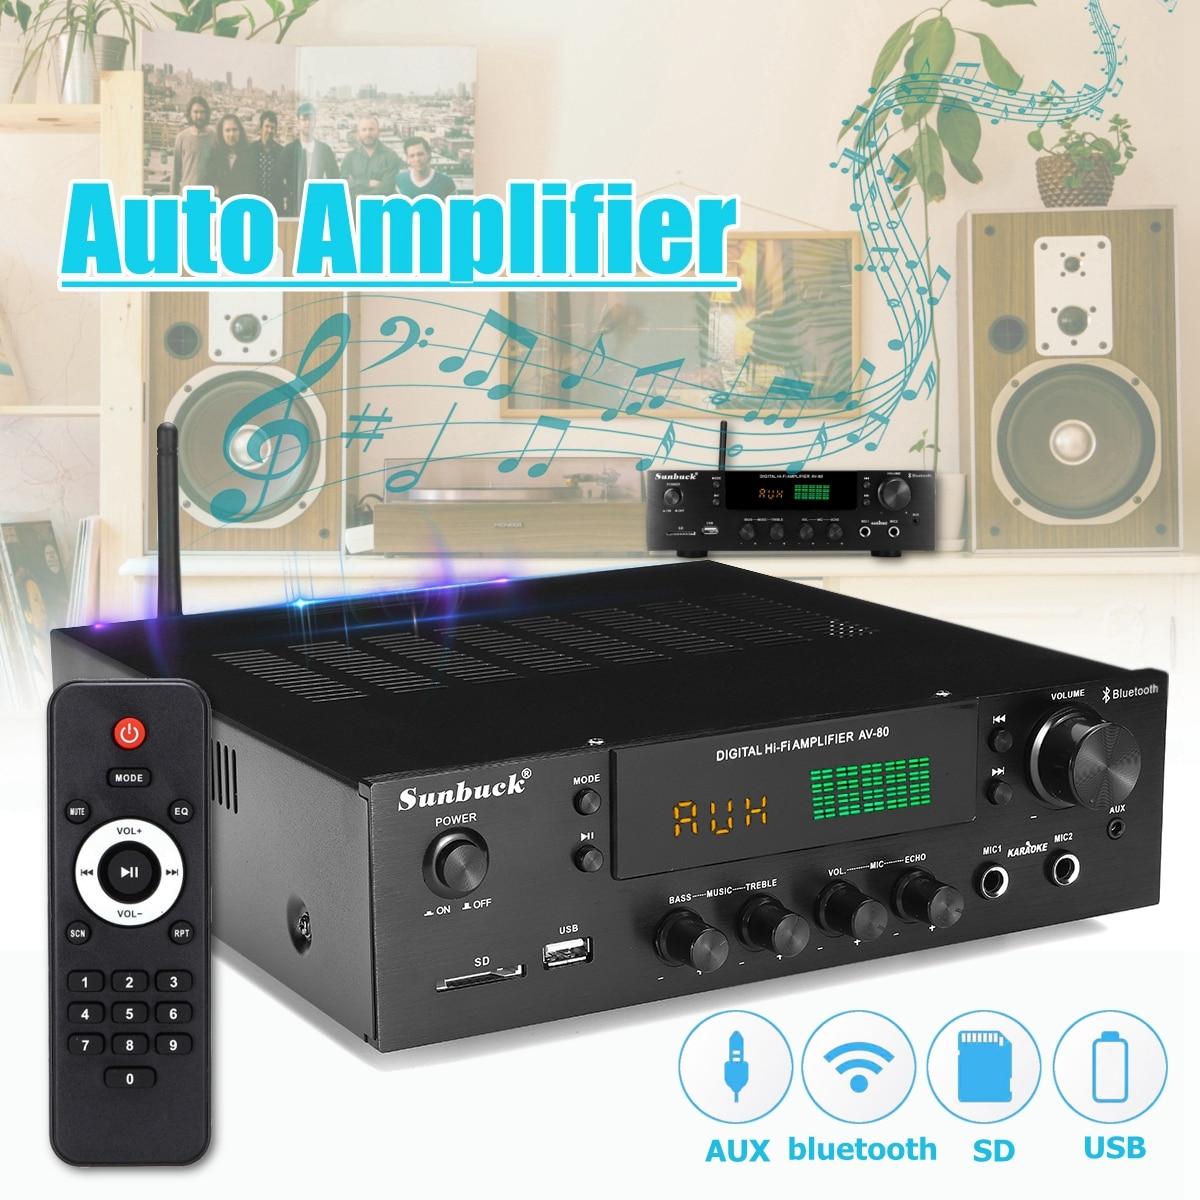 220V-240V 1388 2*200W bluetooth Stereo 2.0 Amplifier HiFi Power Remote Control USB SD Aux Mic Input Auto Amplifier220V-240V 1388 2*200W bluetooth Stereo 2.0 Amplifier HiFi Power Remote Control USB SD Aux Mic Input Auto Amplifier